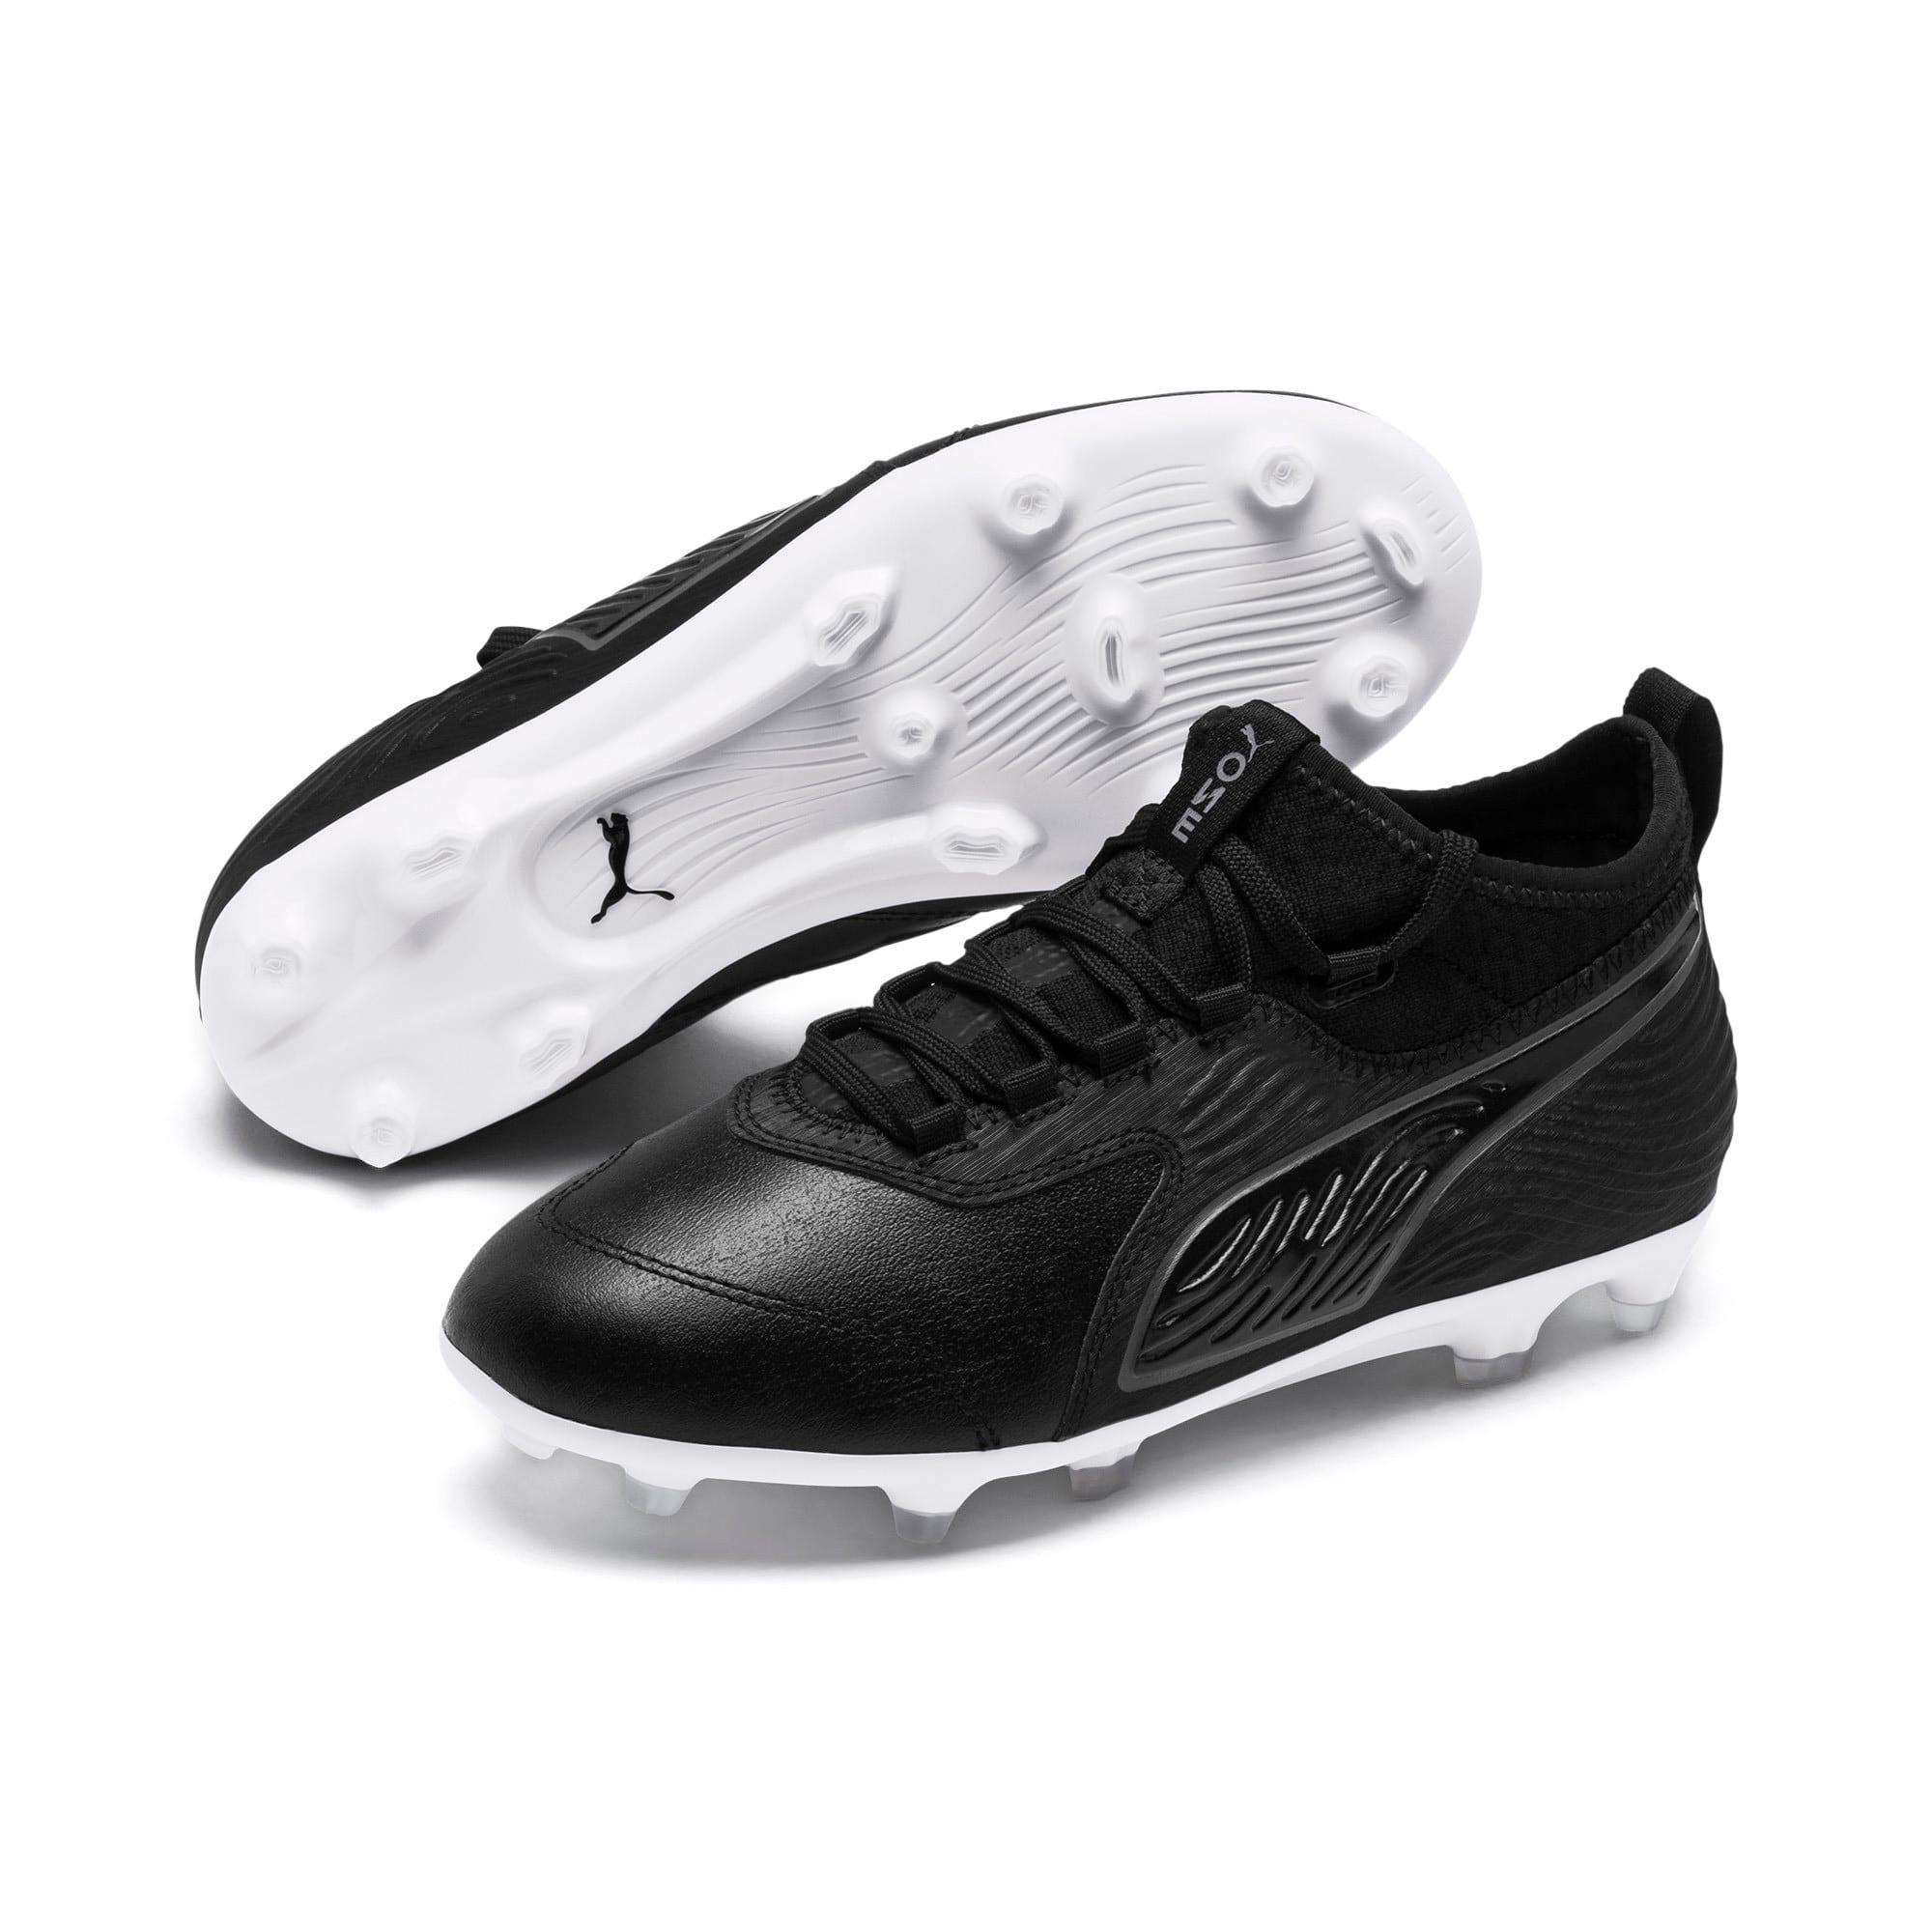 Thumbnail 2 of PUMA ONE 19.3 FG/AG Soccer Cleats JR, Puma Black-Puma Black-White, medium